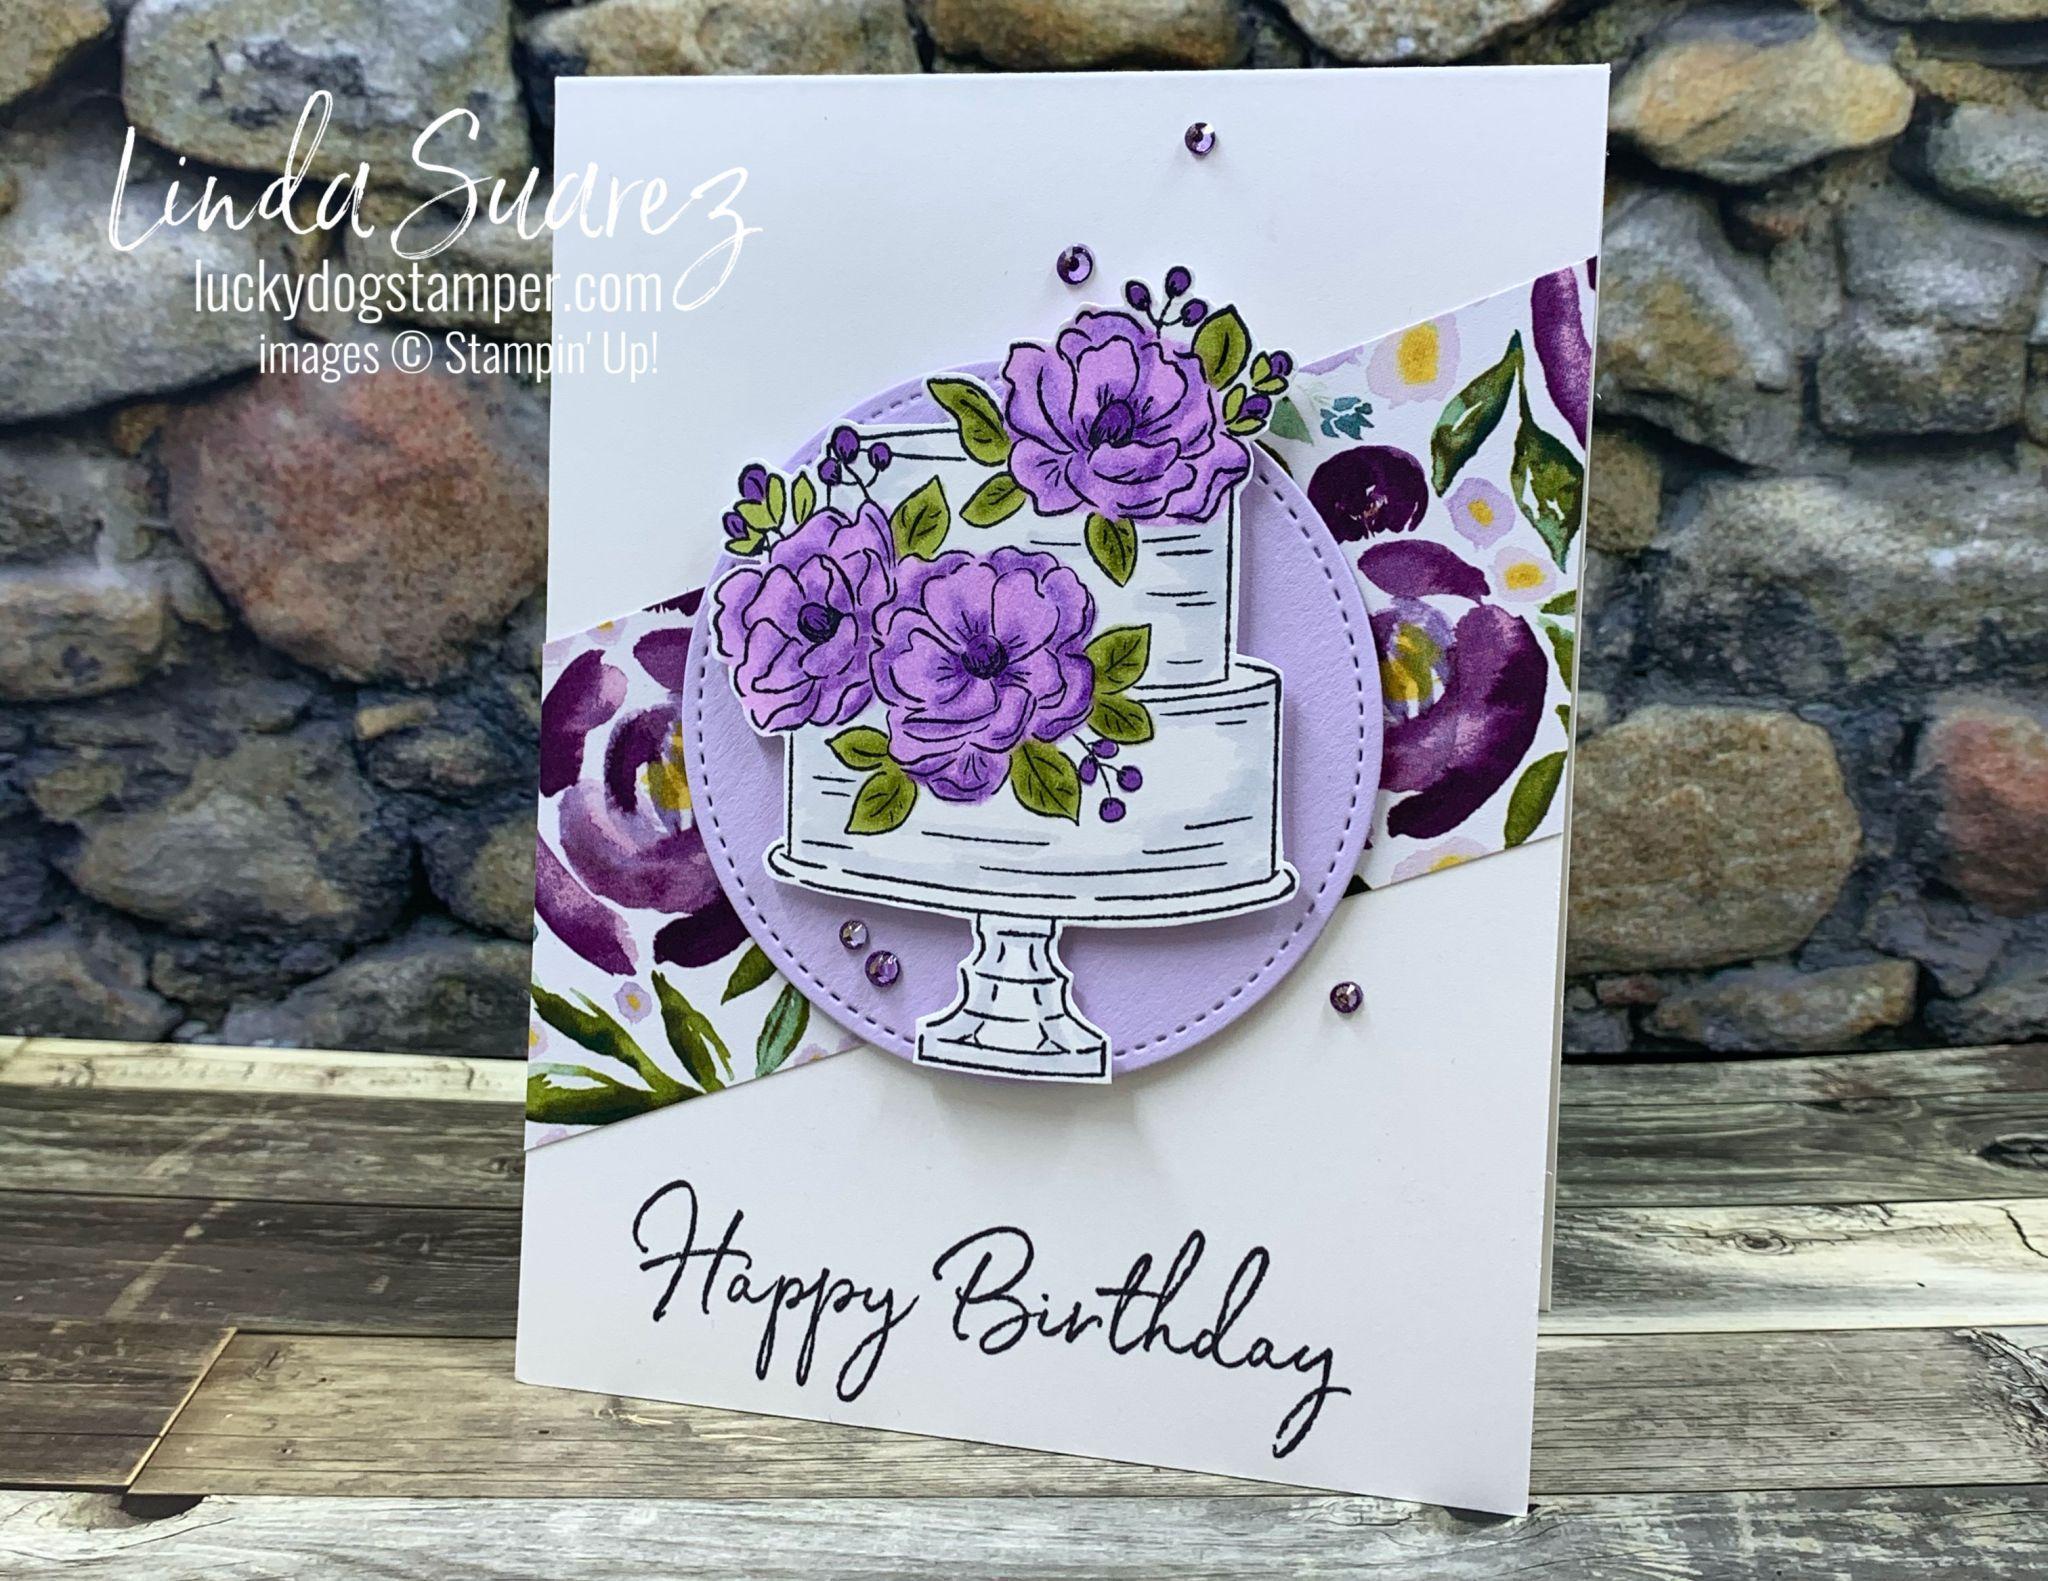 Happy Birthday to You! Lucky Dog Stamper Poppy cards